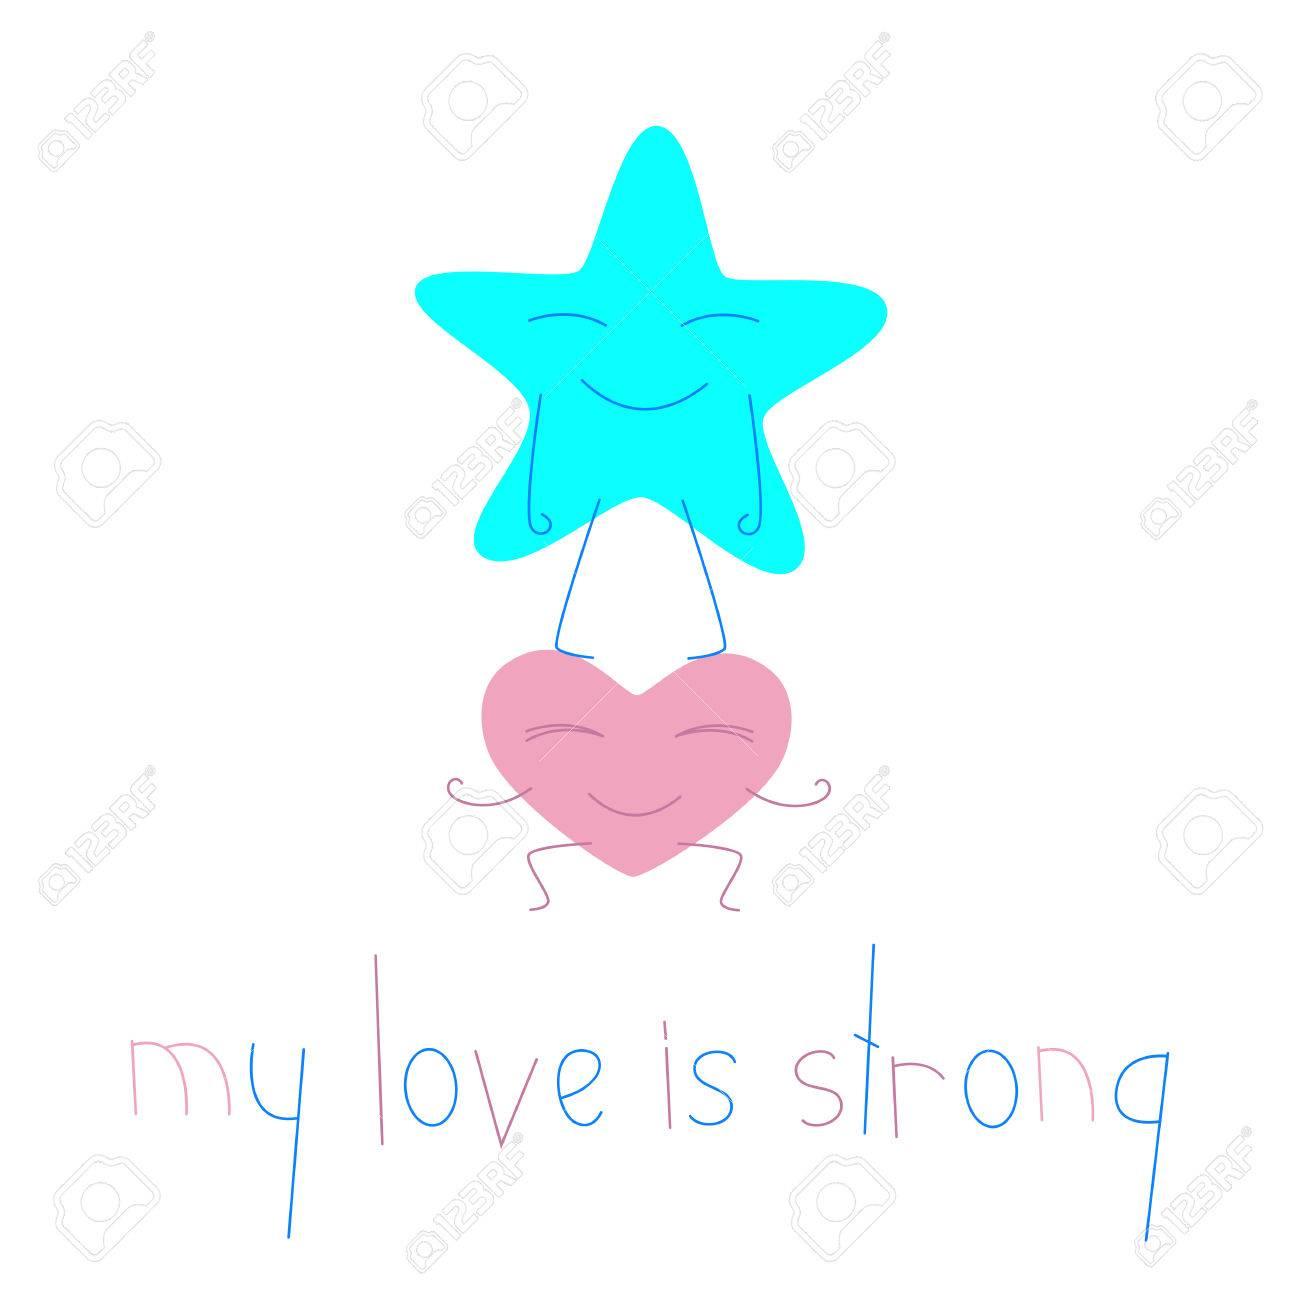 heart cartoon character holding big star character lettering rh 123rf com Tall Clip Art Strong Man Clip Art